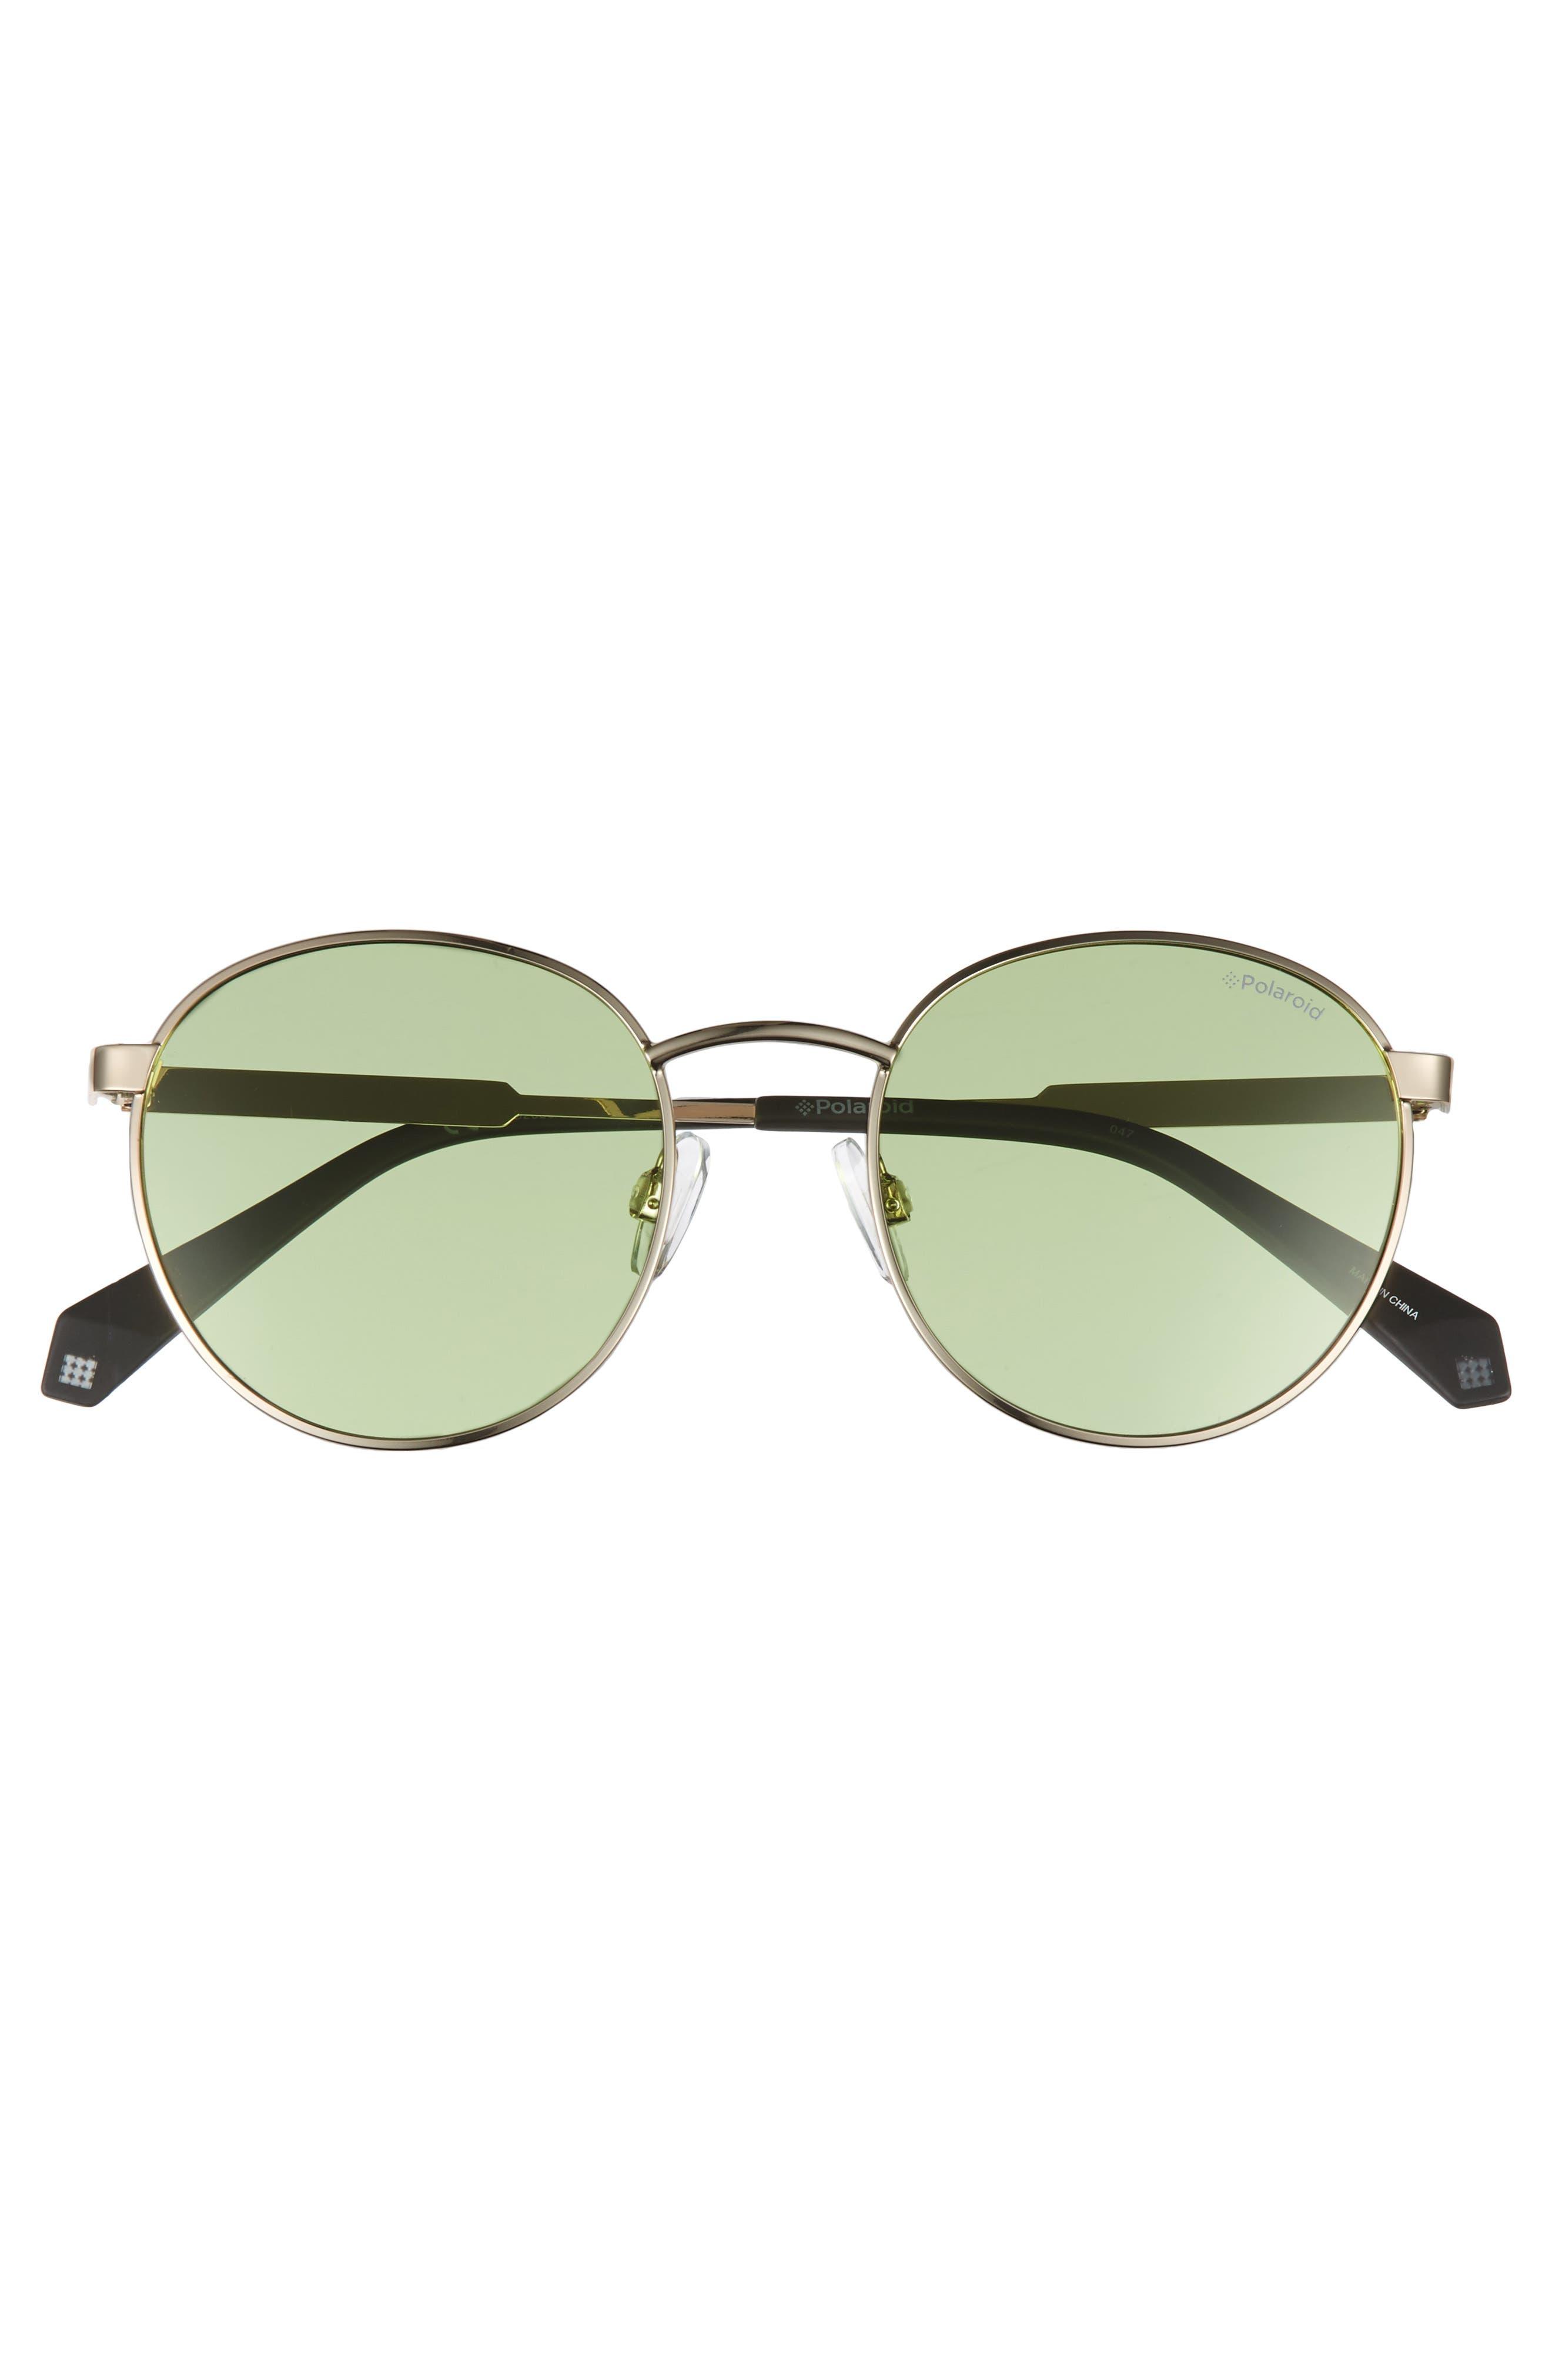 51mm Round Retro Polarized Sunglasses,                             Alternate thumbnail 3, color,                             Green